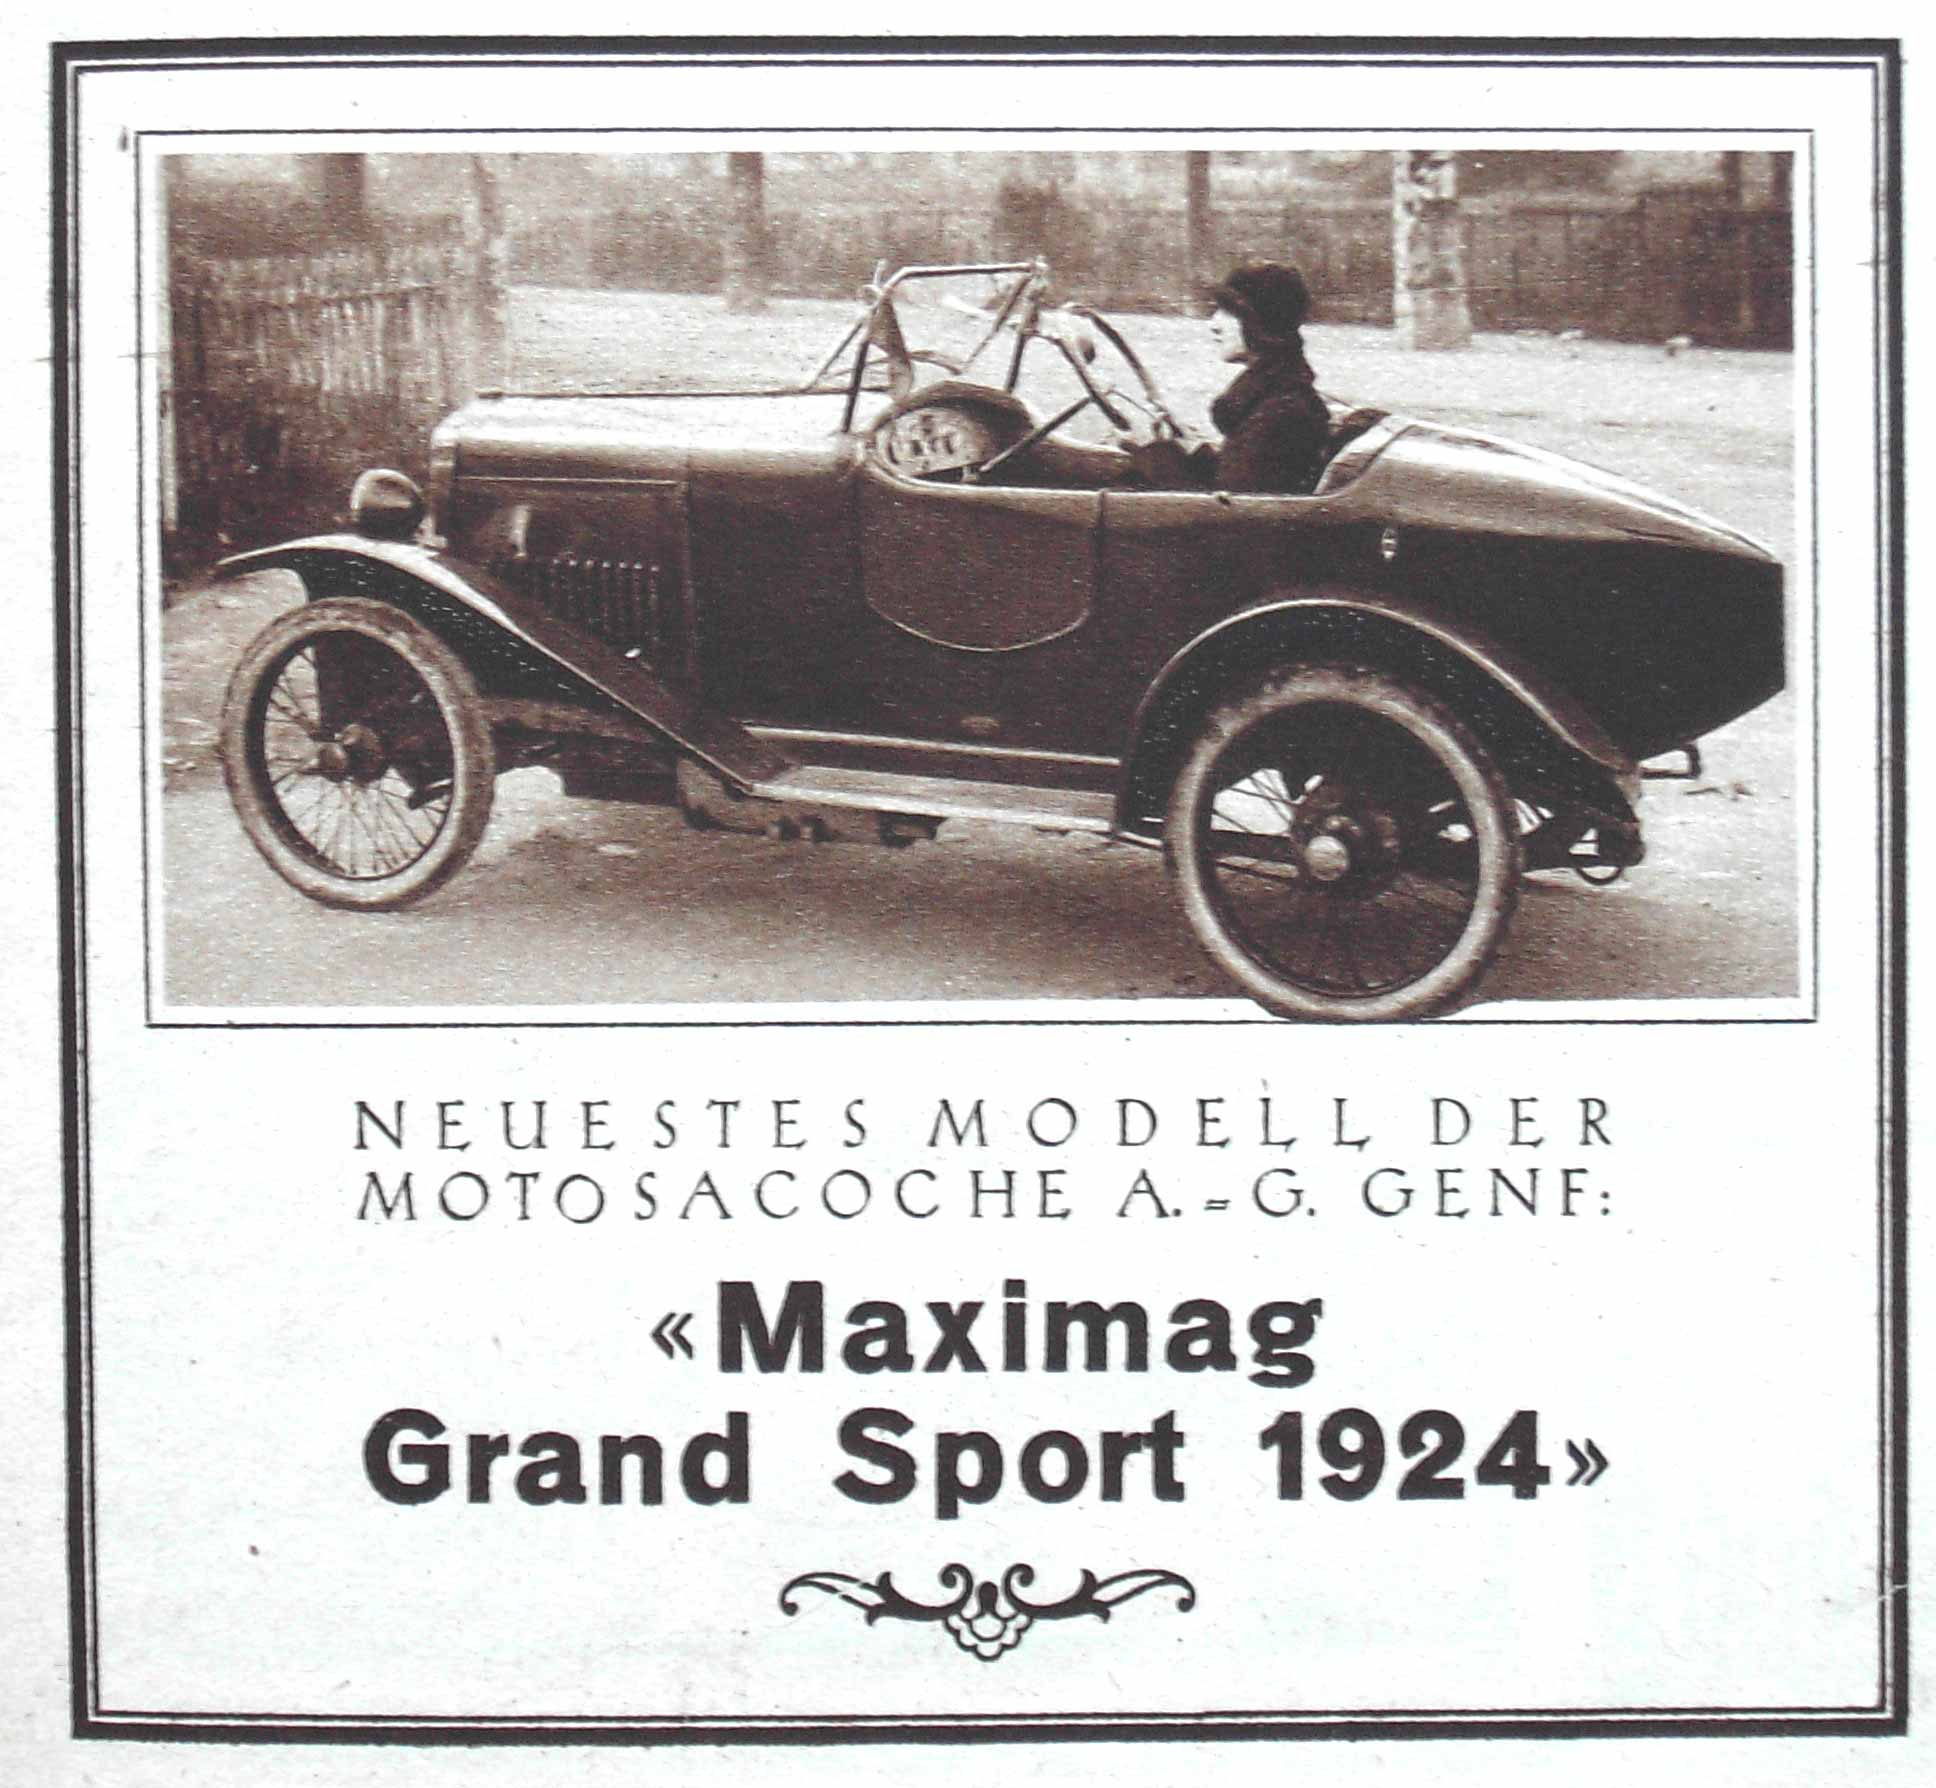 Schweizer Werbung Motosacoche 1924